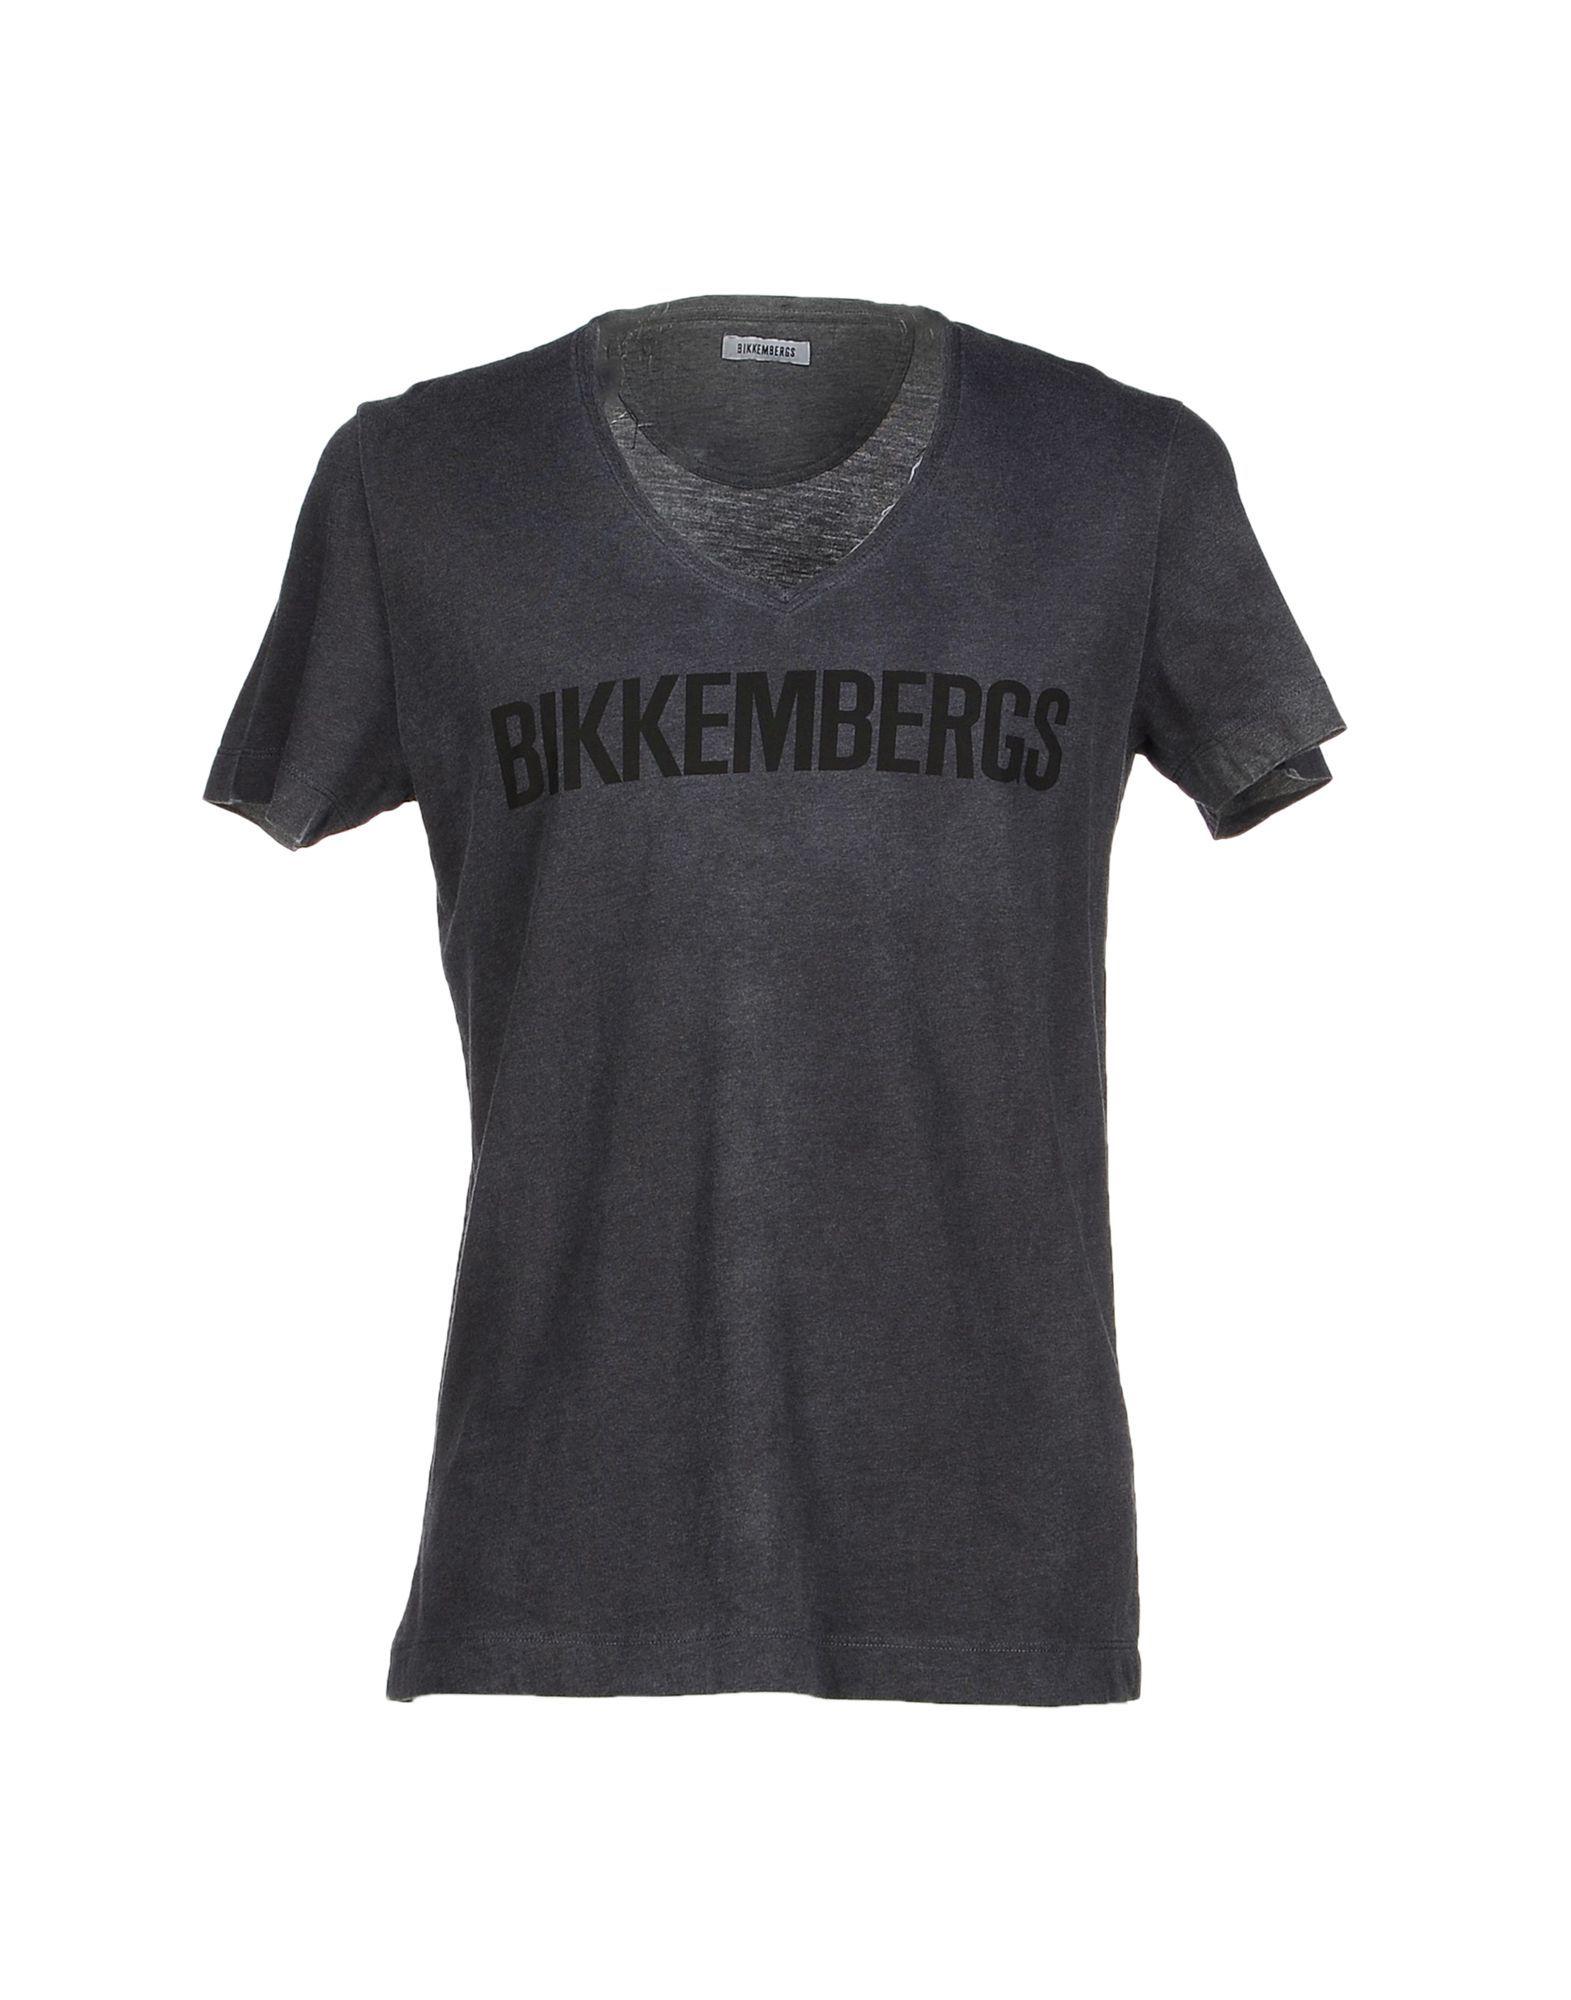 Bikkembergs T-Shirt - Men Bikkembergs T-Shirts online on YOOX Egypt - 37759120KB